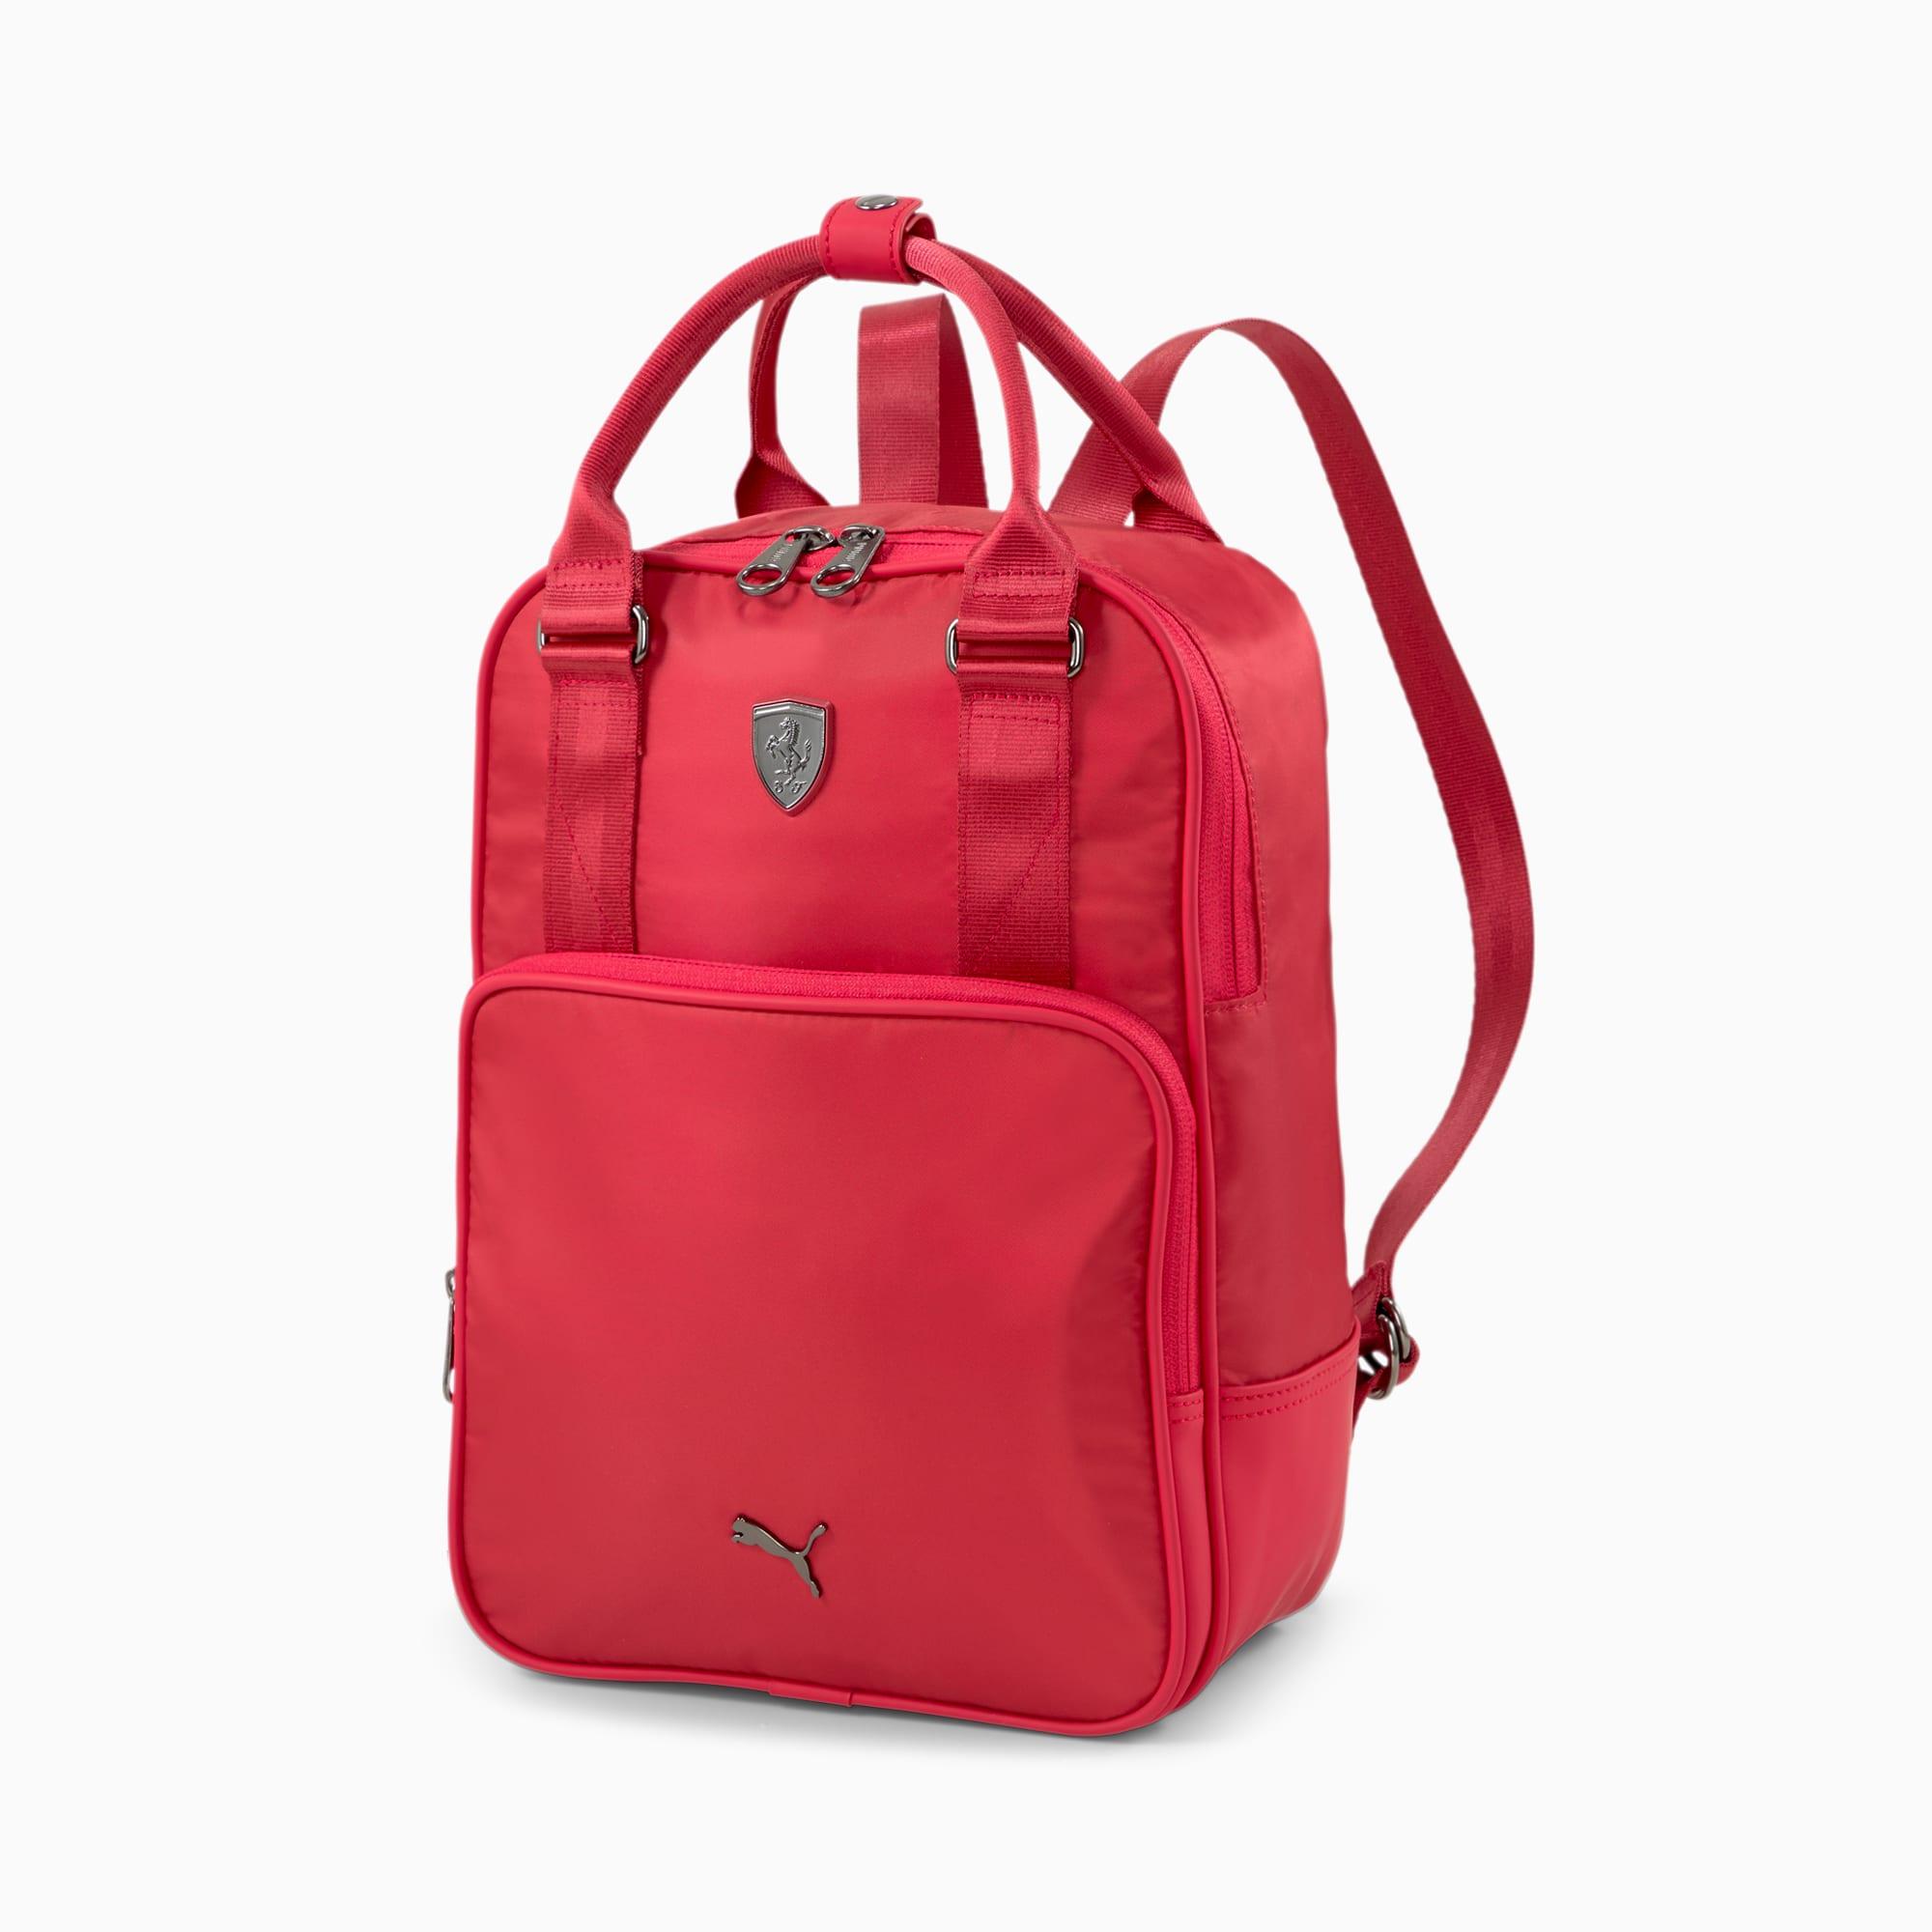 Scuderia Ferrari Women's Backpack, American Beauty, extralarge